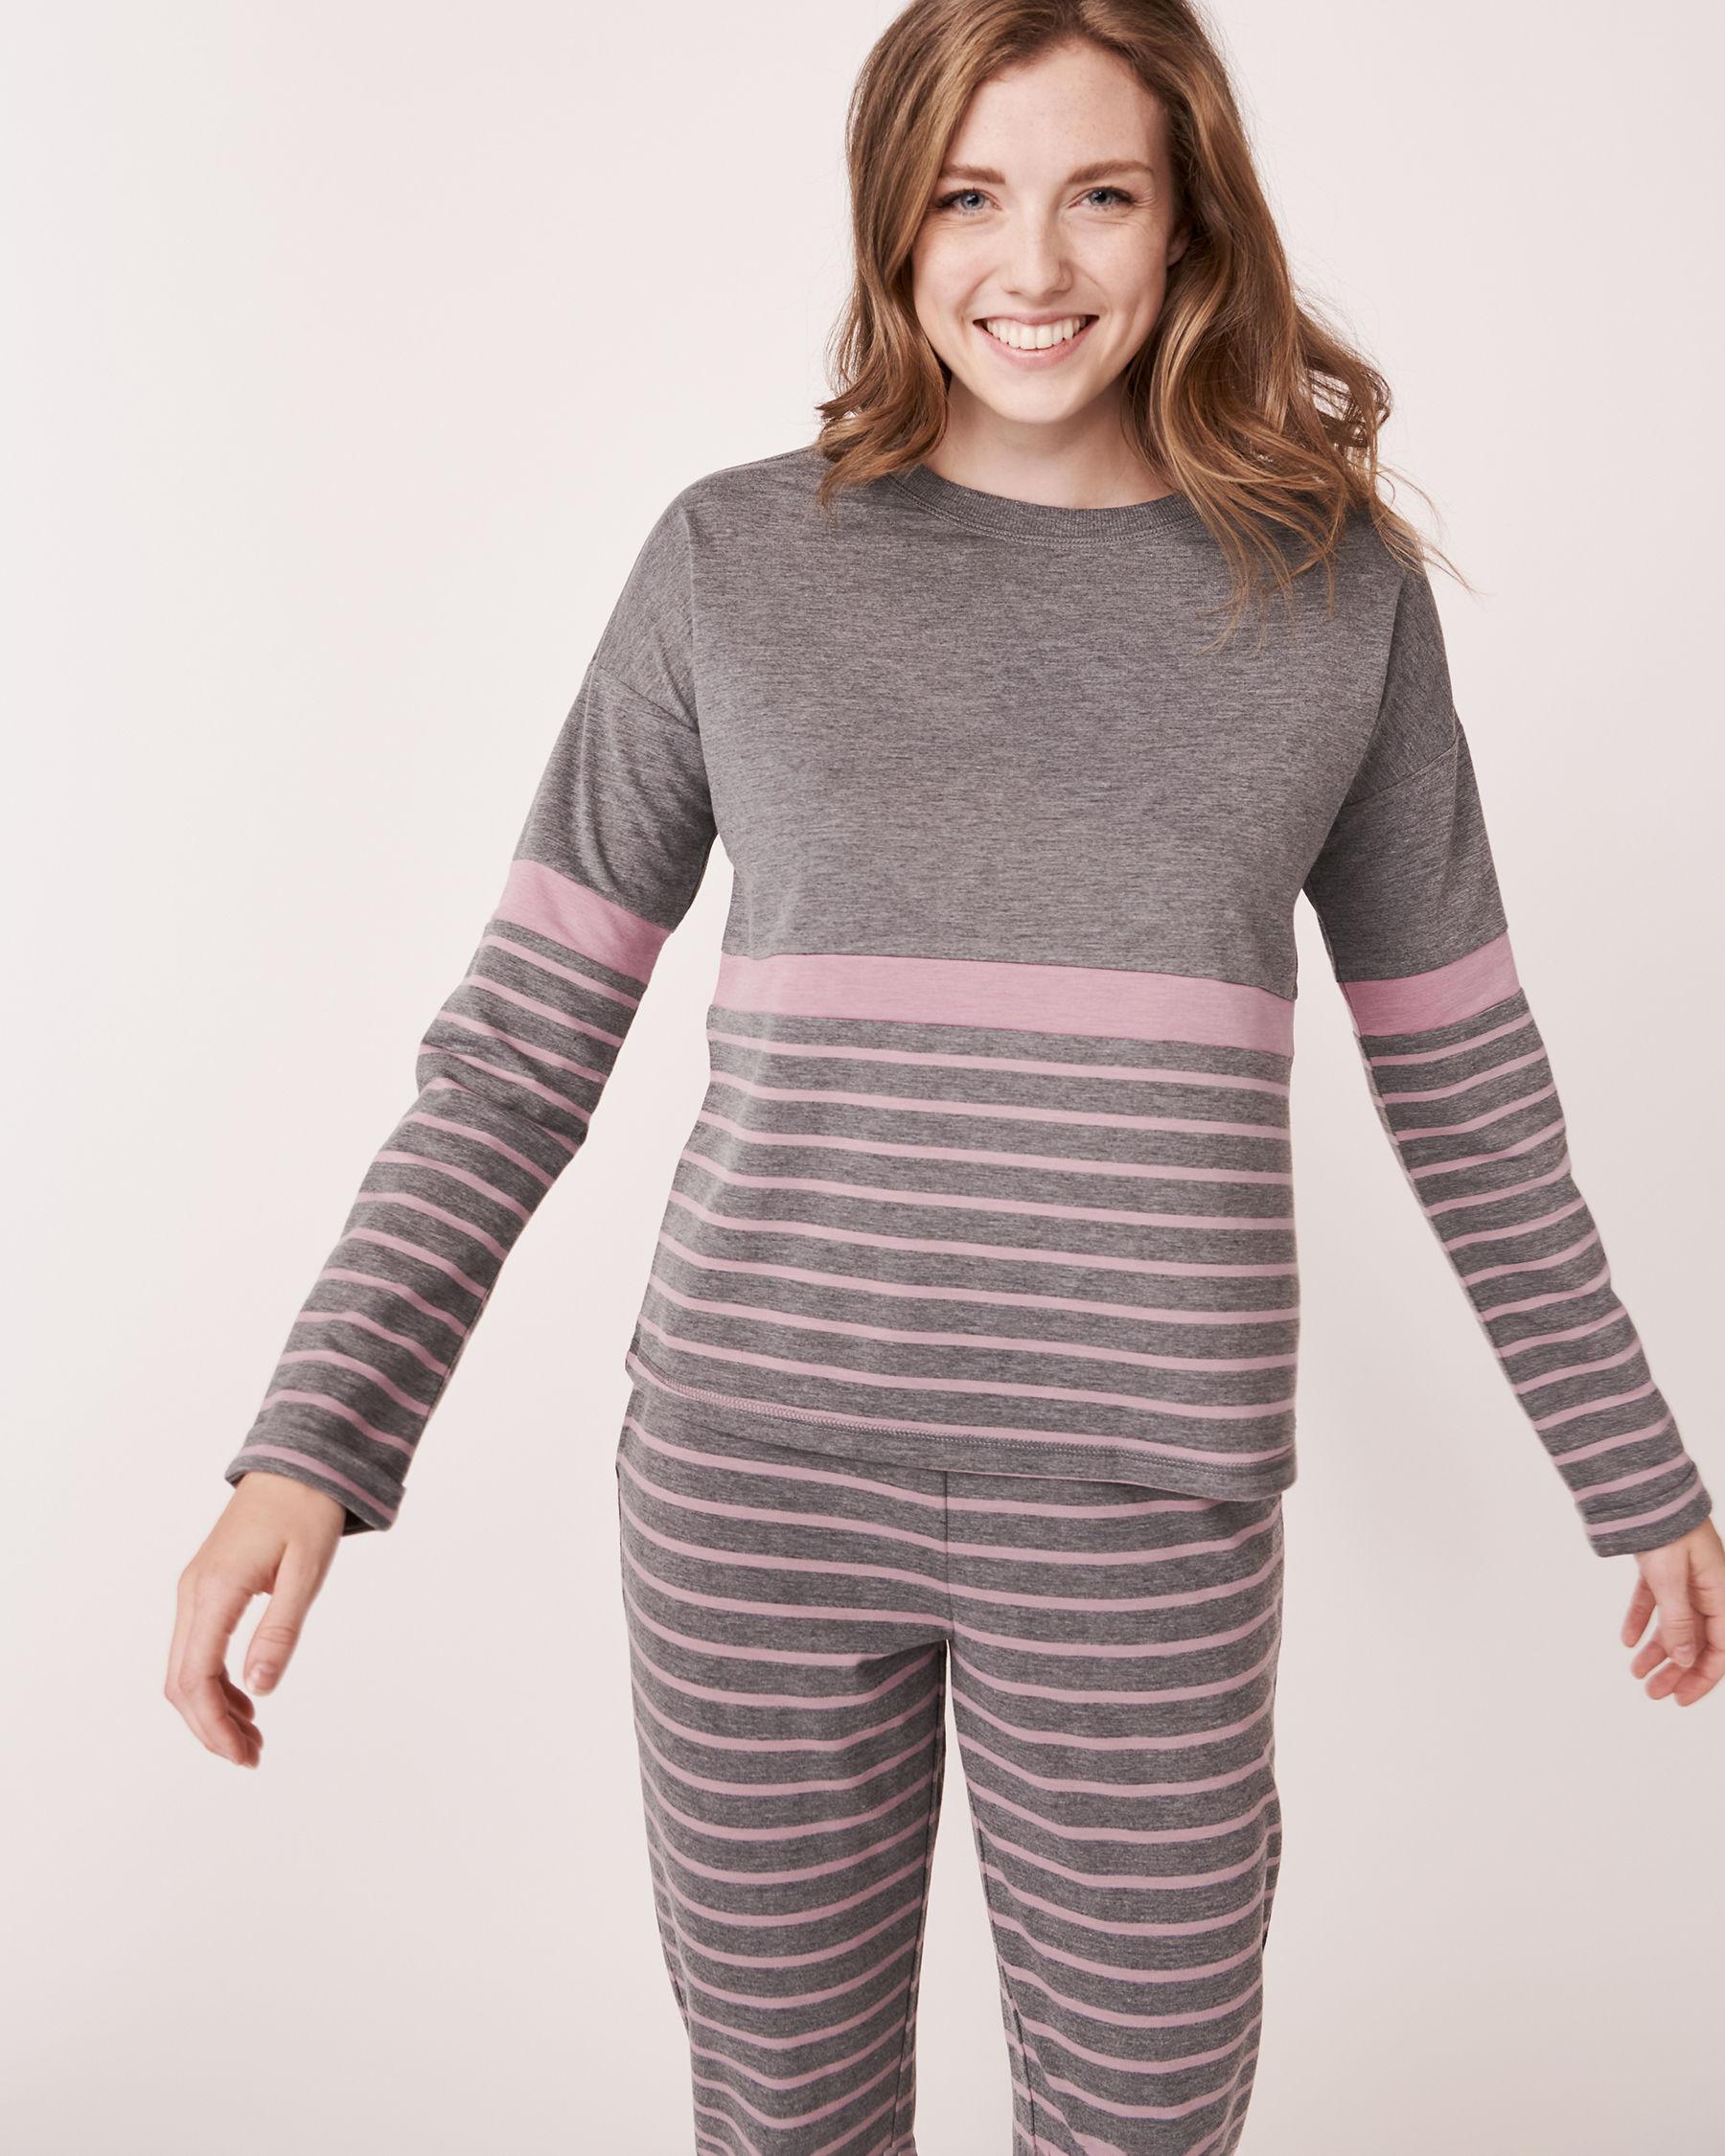 LA VIE EN ROSE Long Sleeve Striped Shirt Grey and pink mix 768-373-0-11 - View1